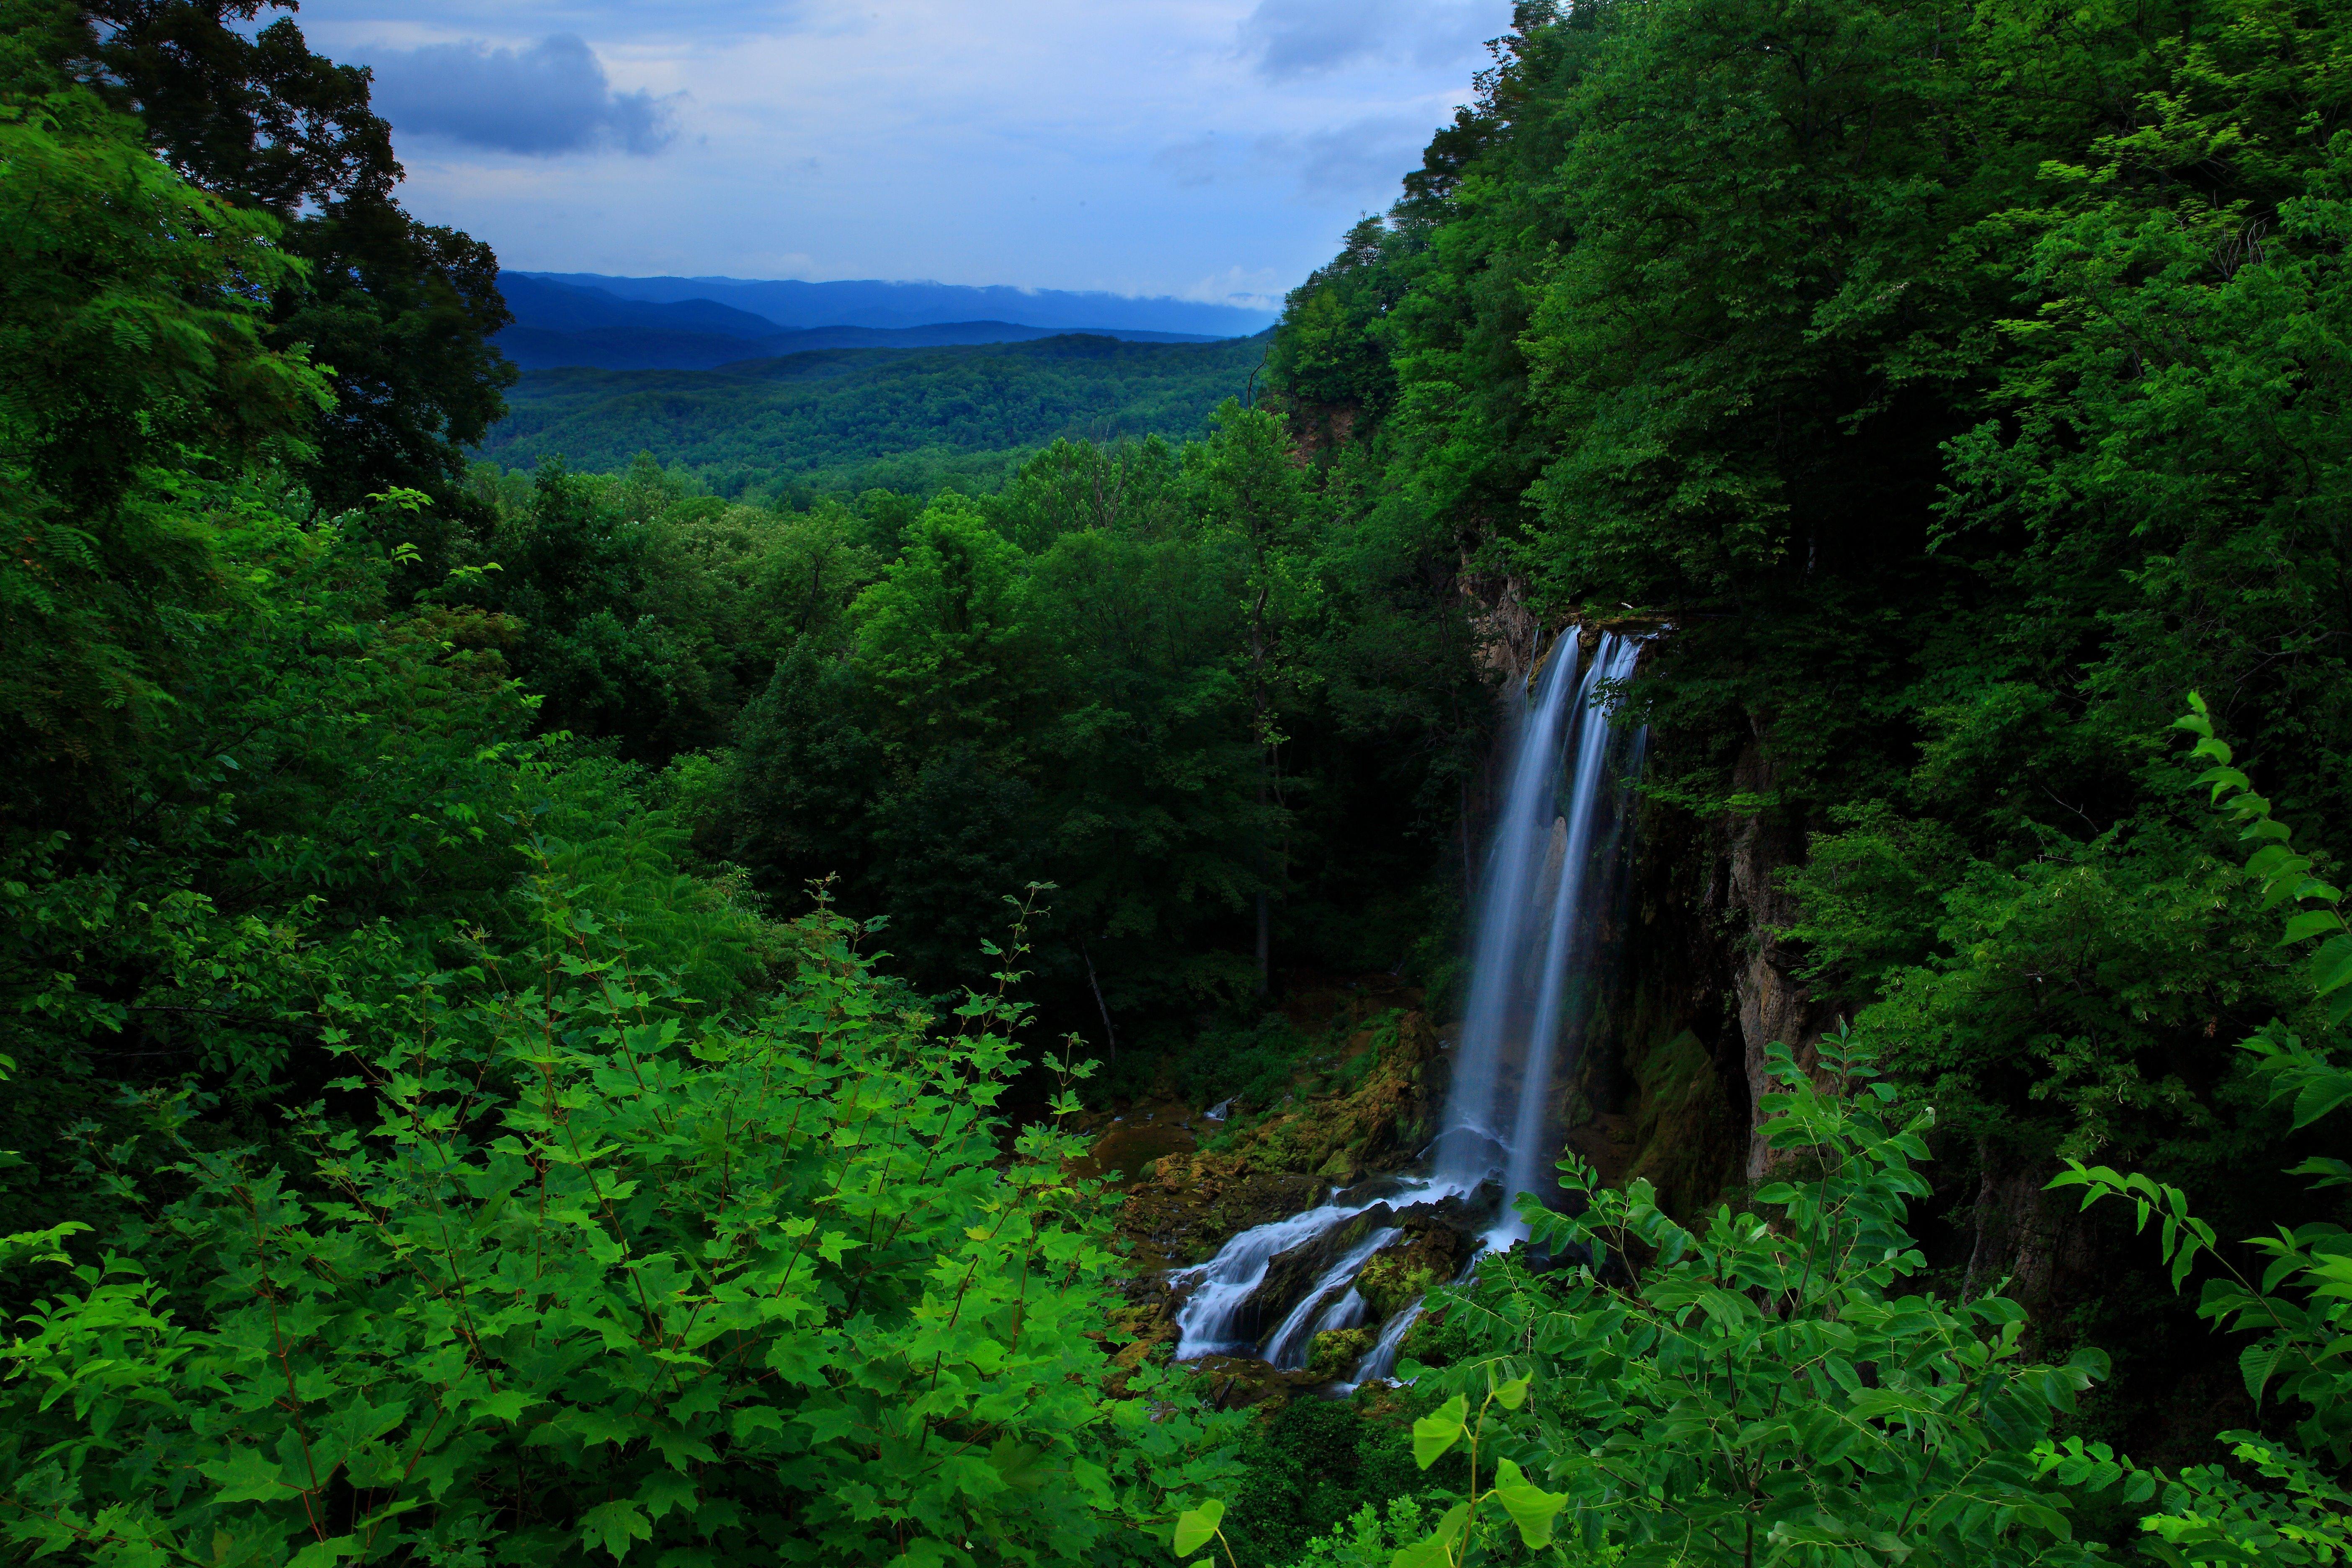 Blue Ridge Mountain North Carolina Landscape Paintings